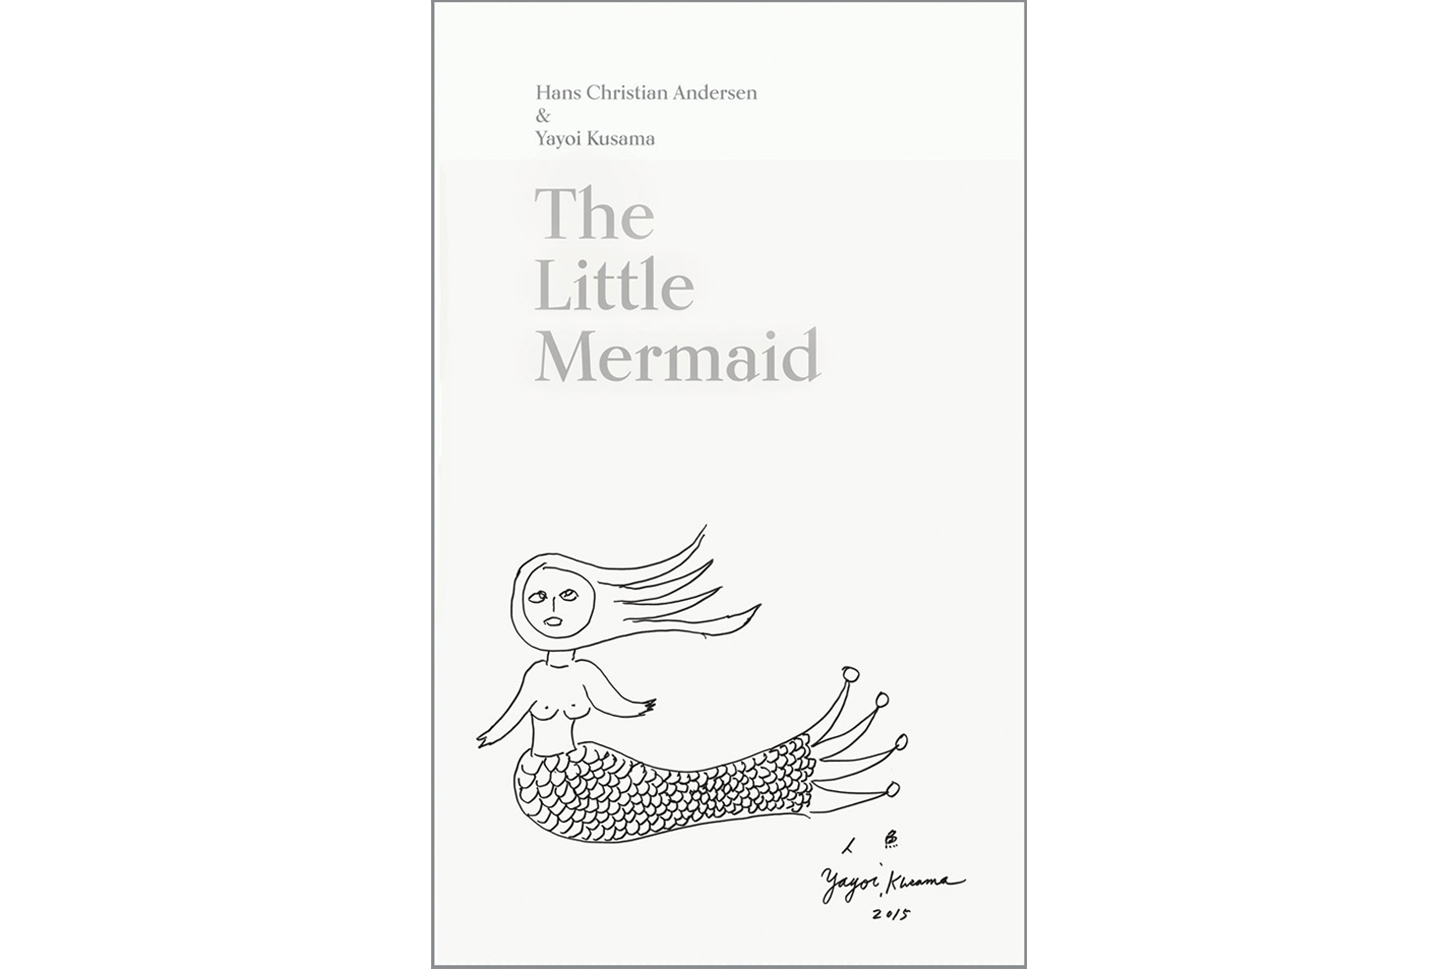 Yayoi Kusama Reinterprets 'The Little Mermaid' in New Illustrated Book